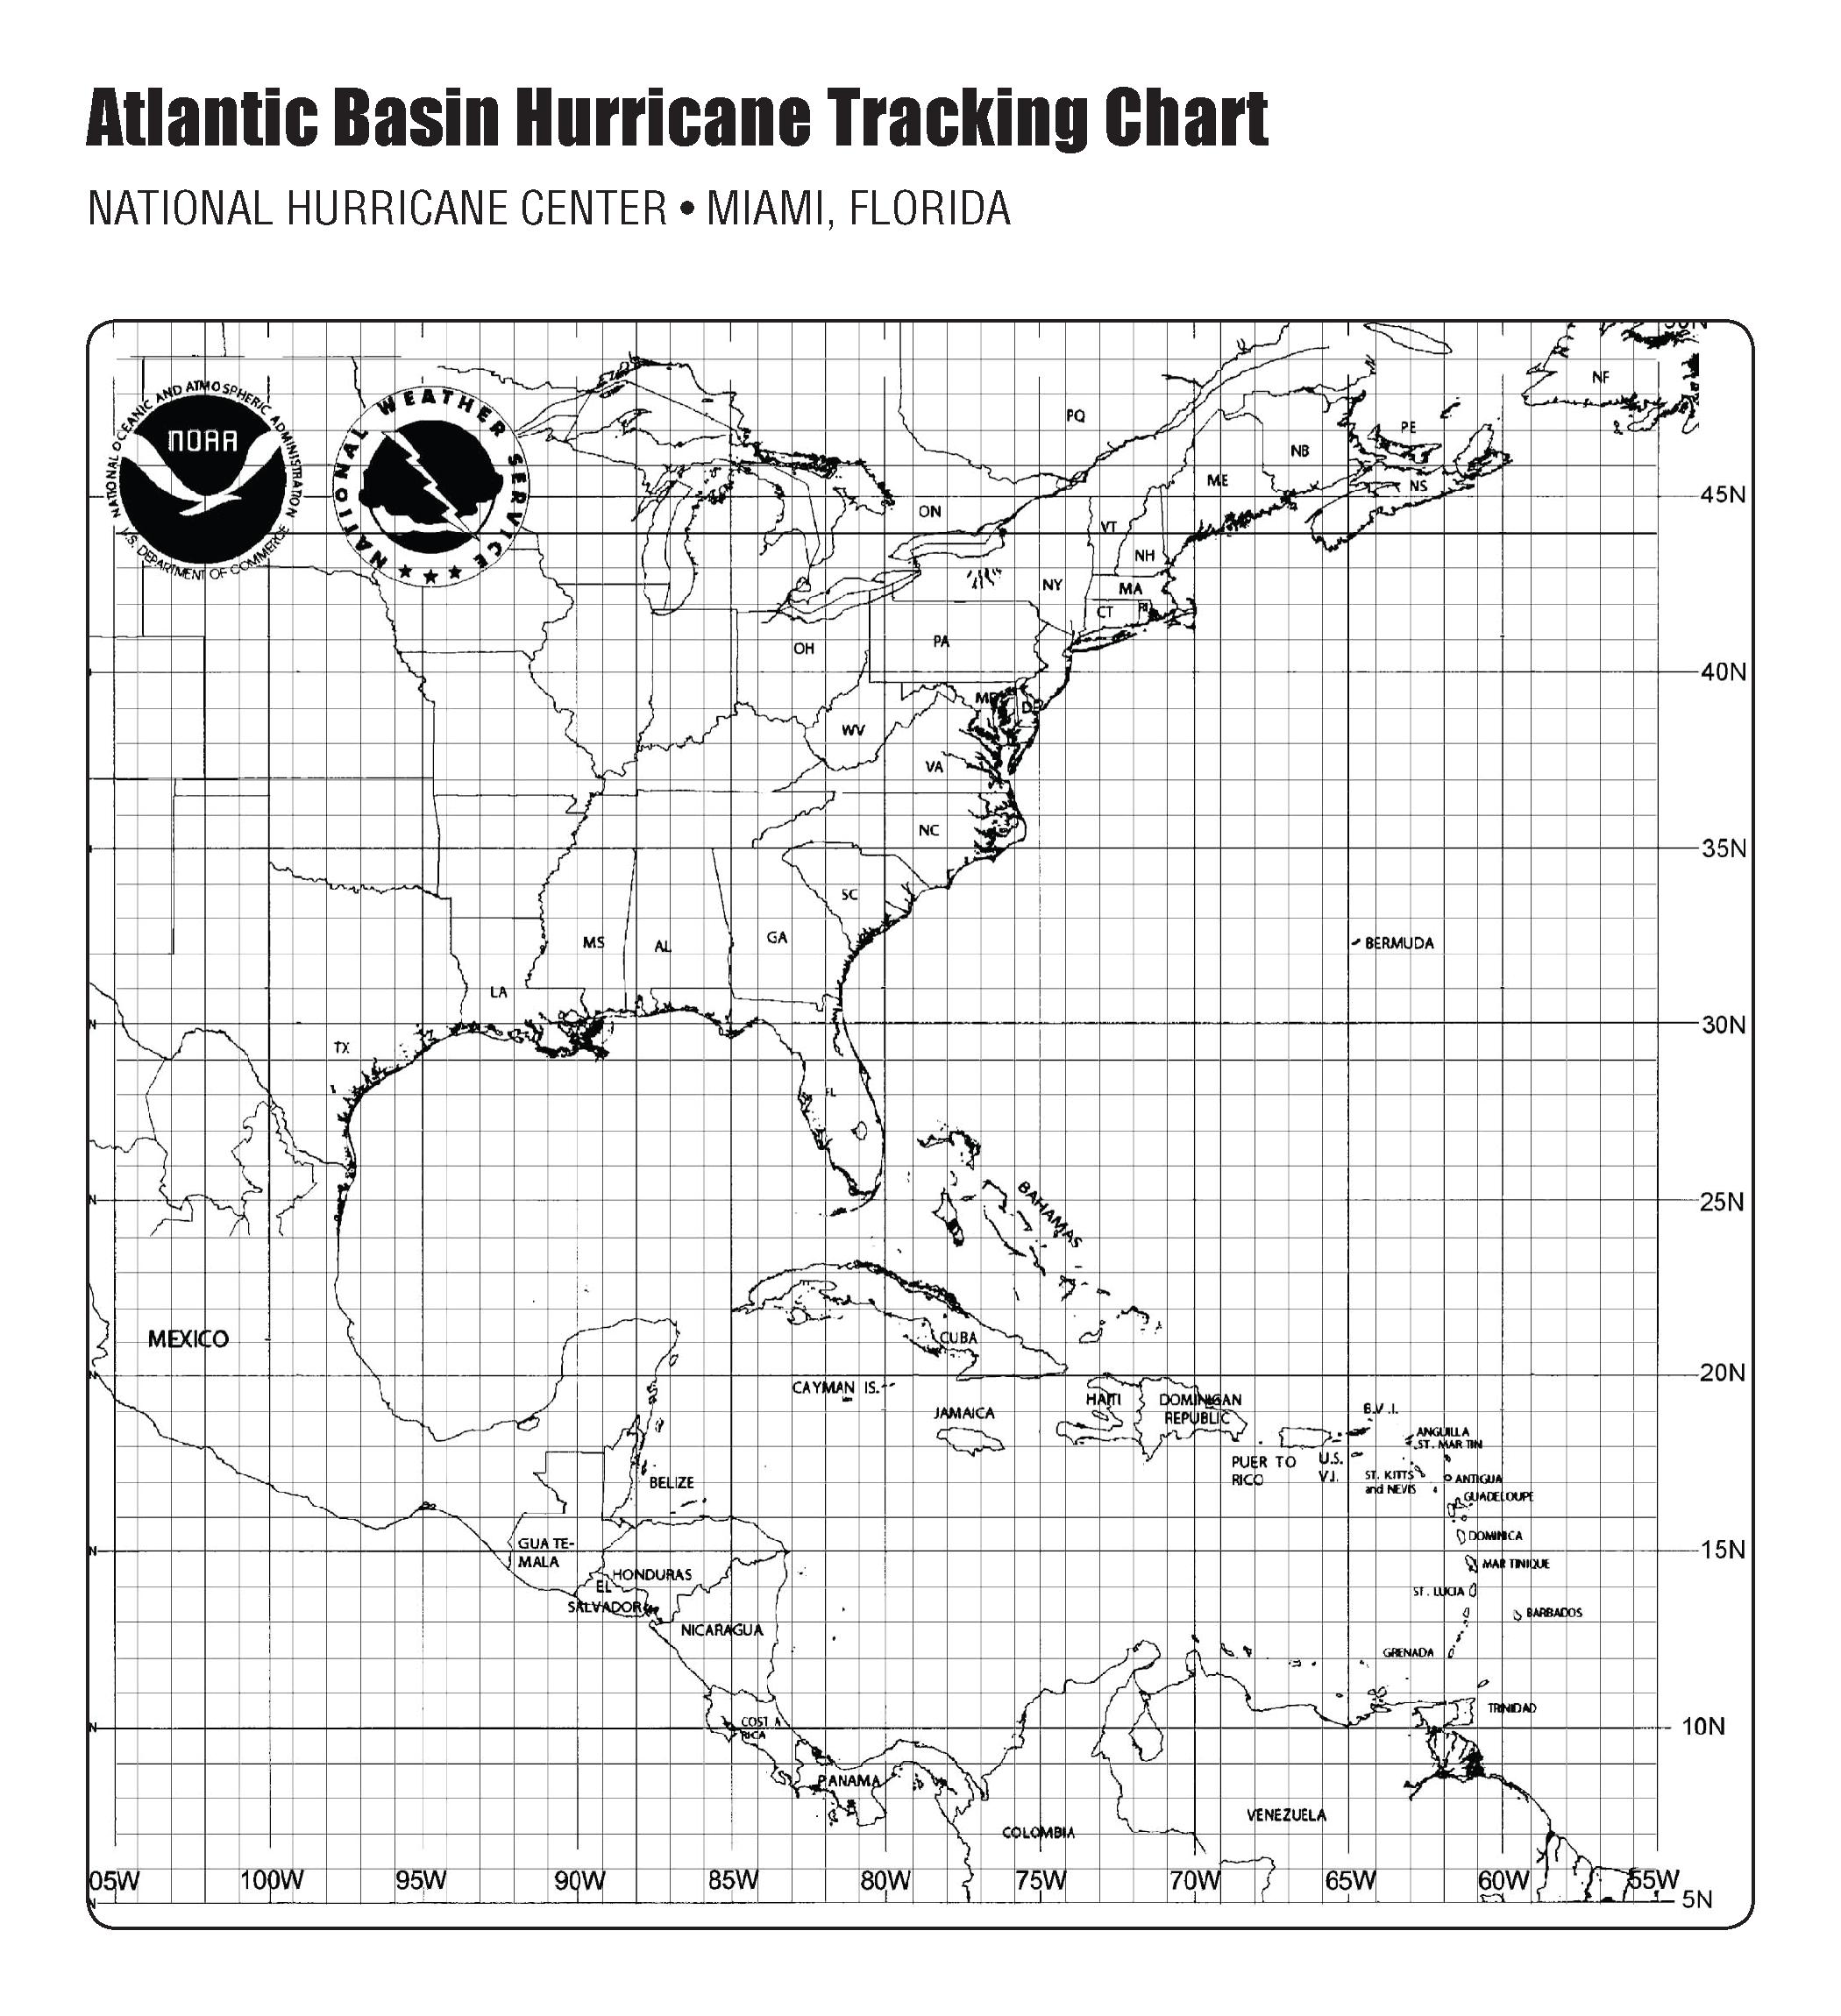 Atlantic Basin Hurricane Tracking Chart